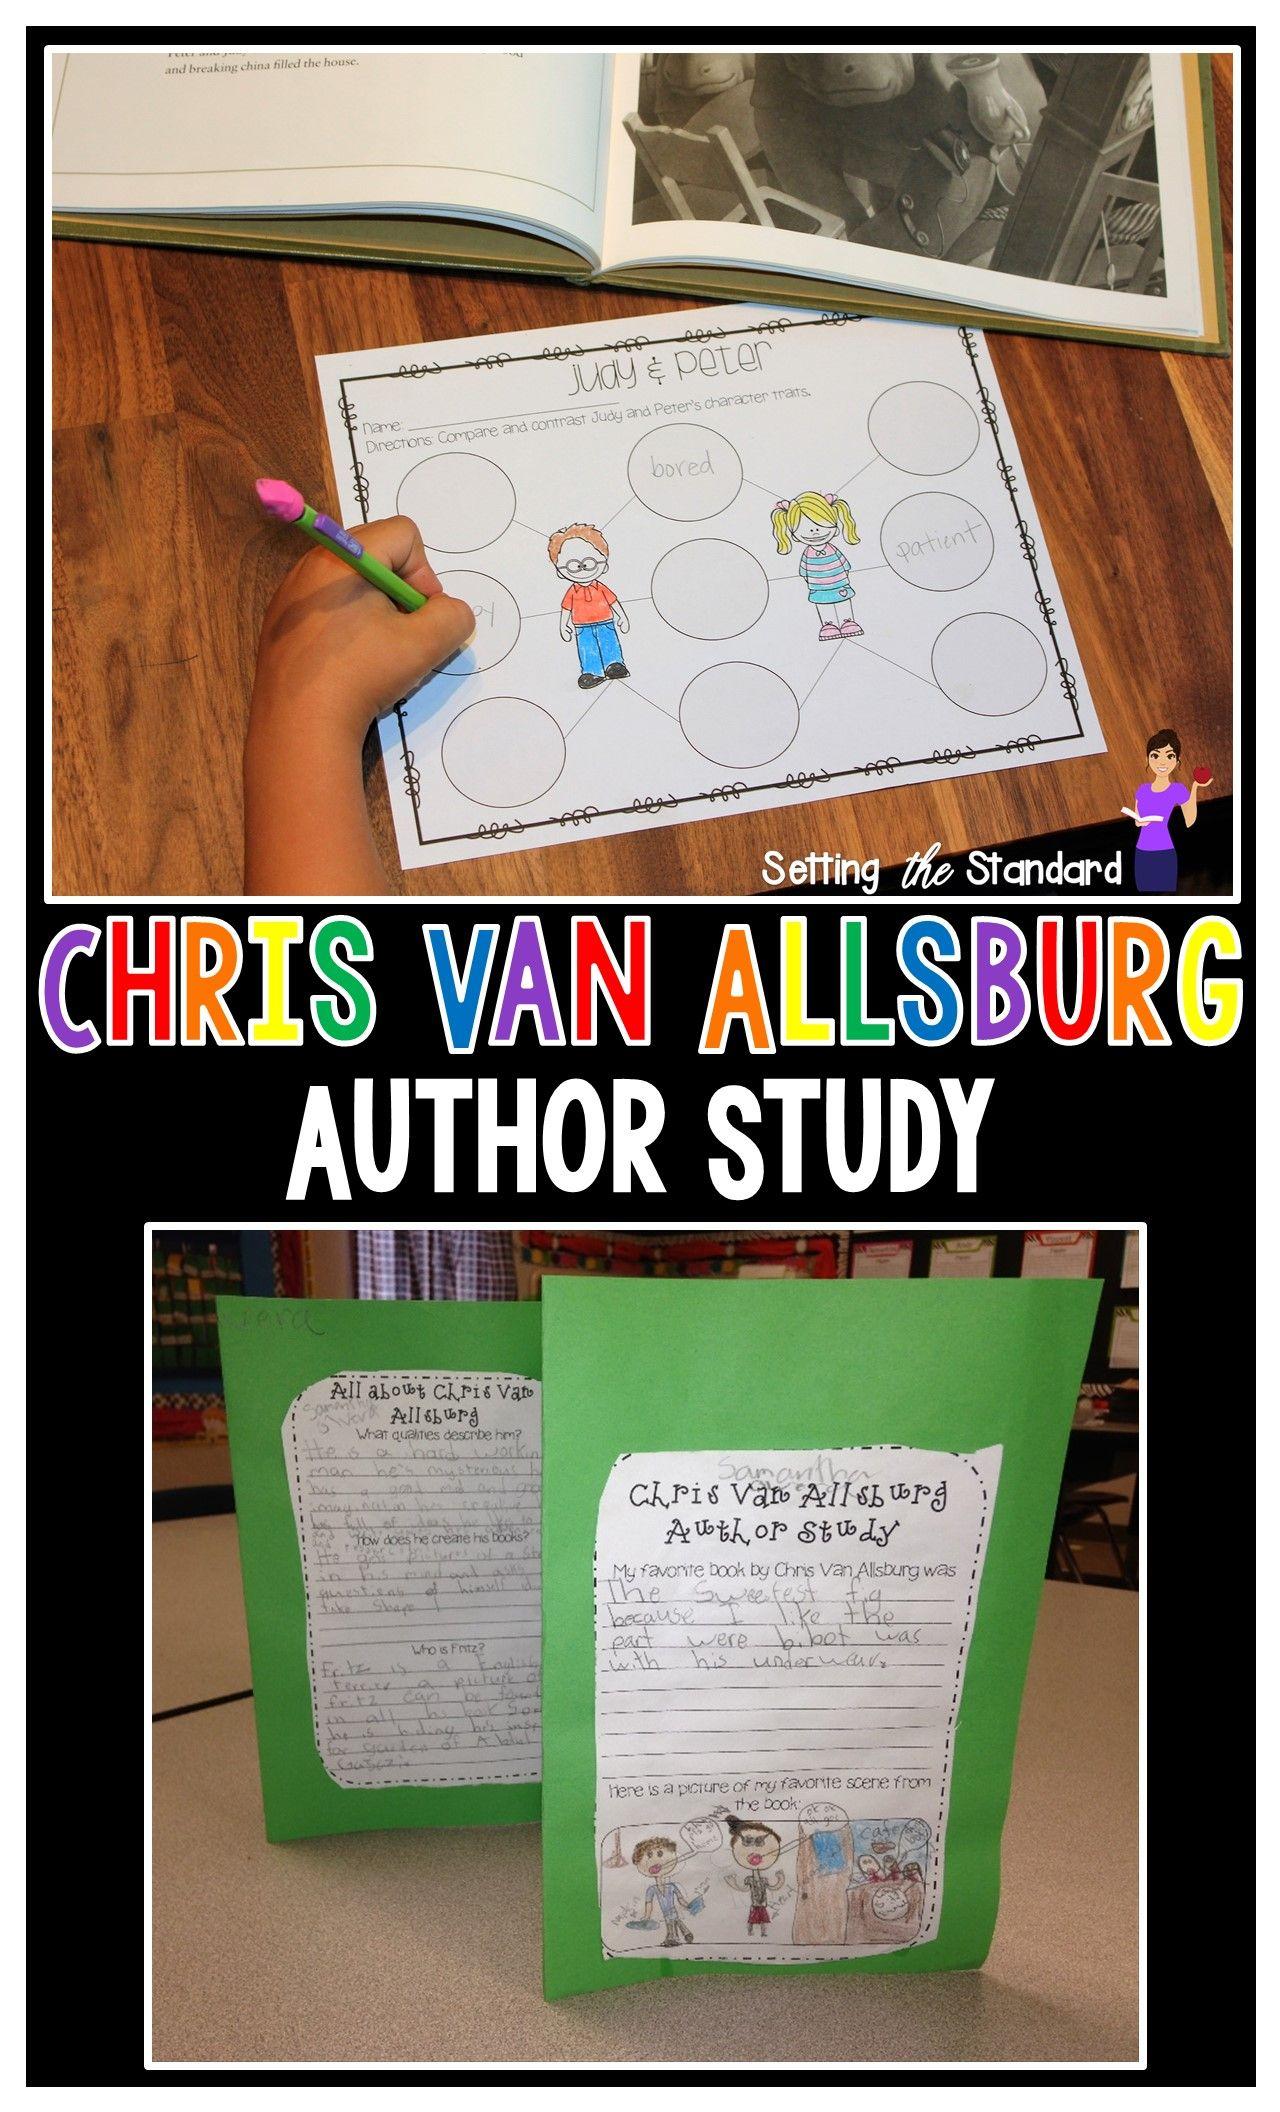 Chris Van Allsburg Author Study With Polar Express With